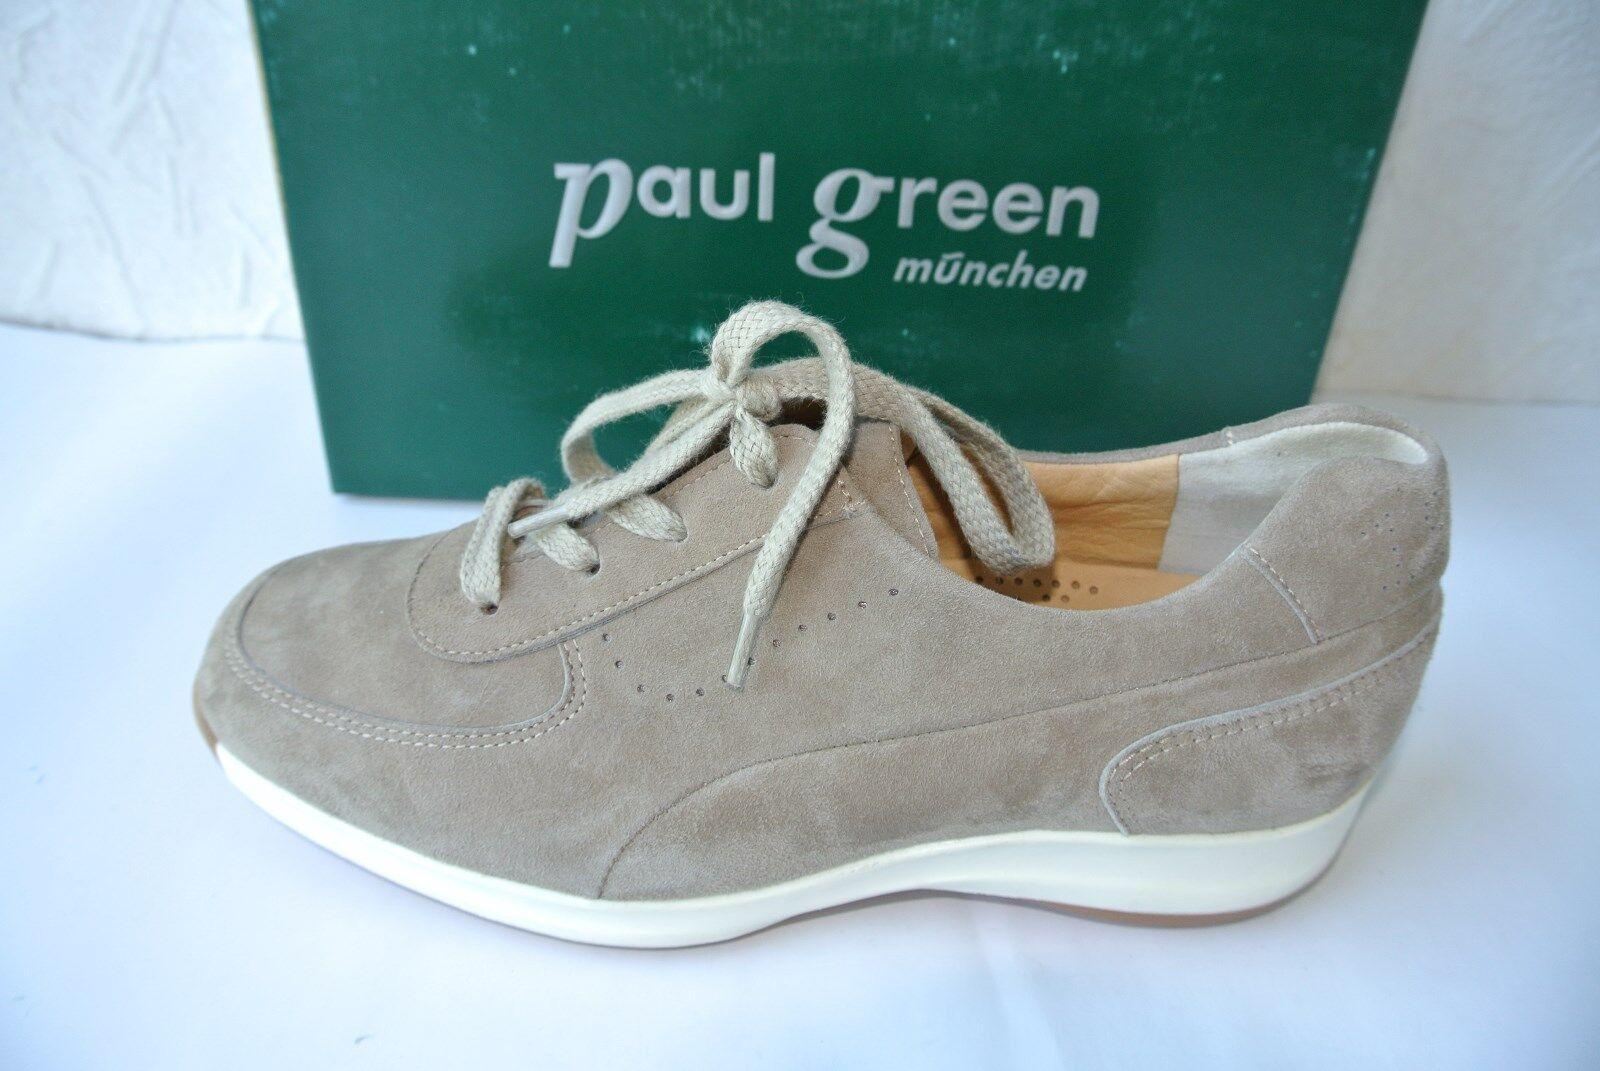 Paul Grün   Damen Schnürschuhe  Sandfarbig  Qualität  Gr.  37 -4,5